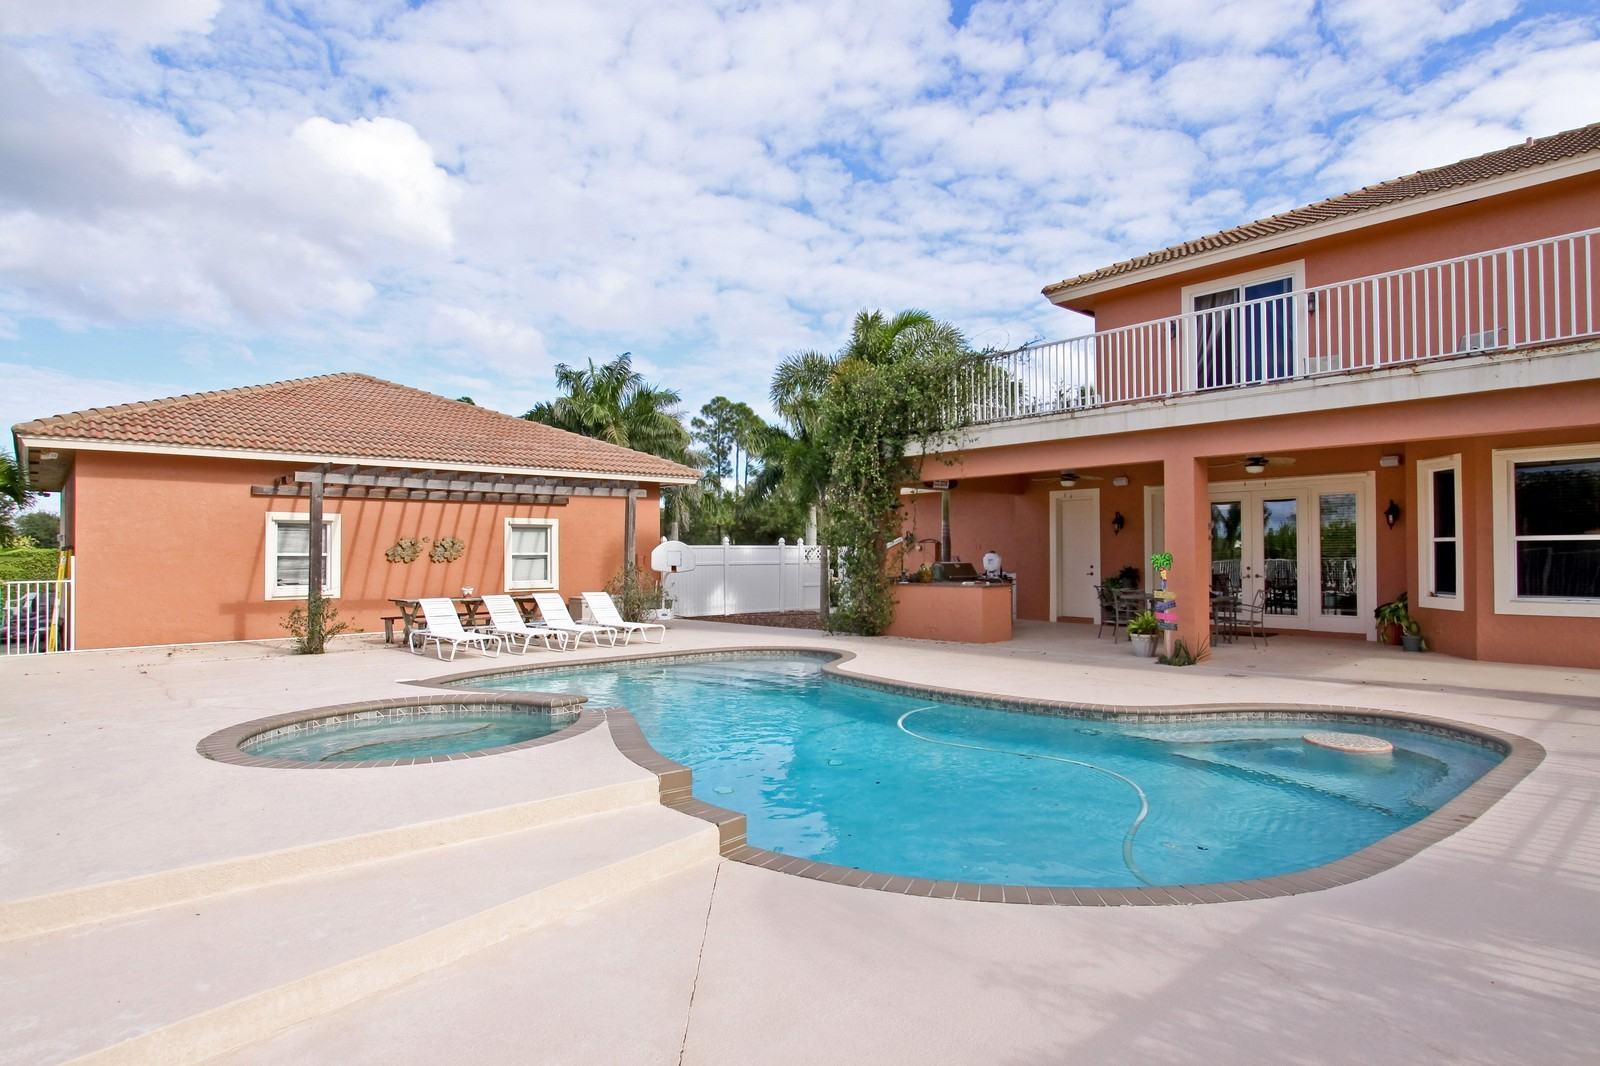 Real Estate Photography - 14542 Draft Horse Ln, Wellington, FL, 33414 - Pool